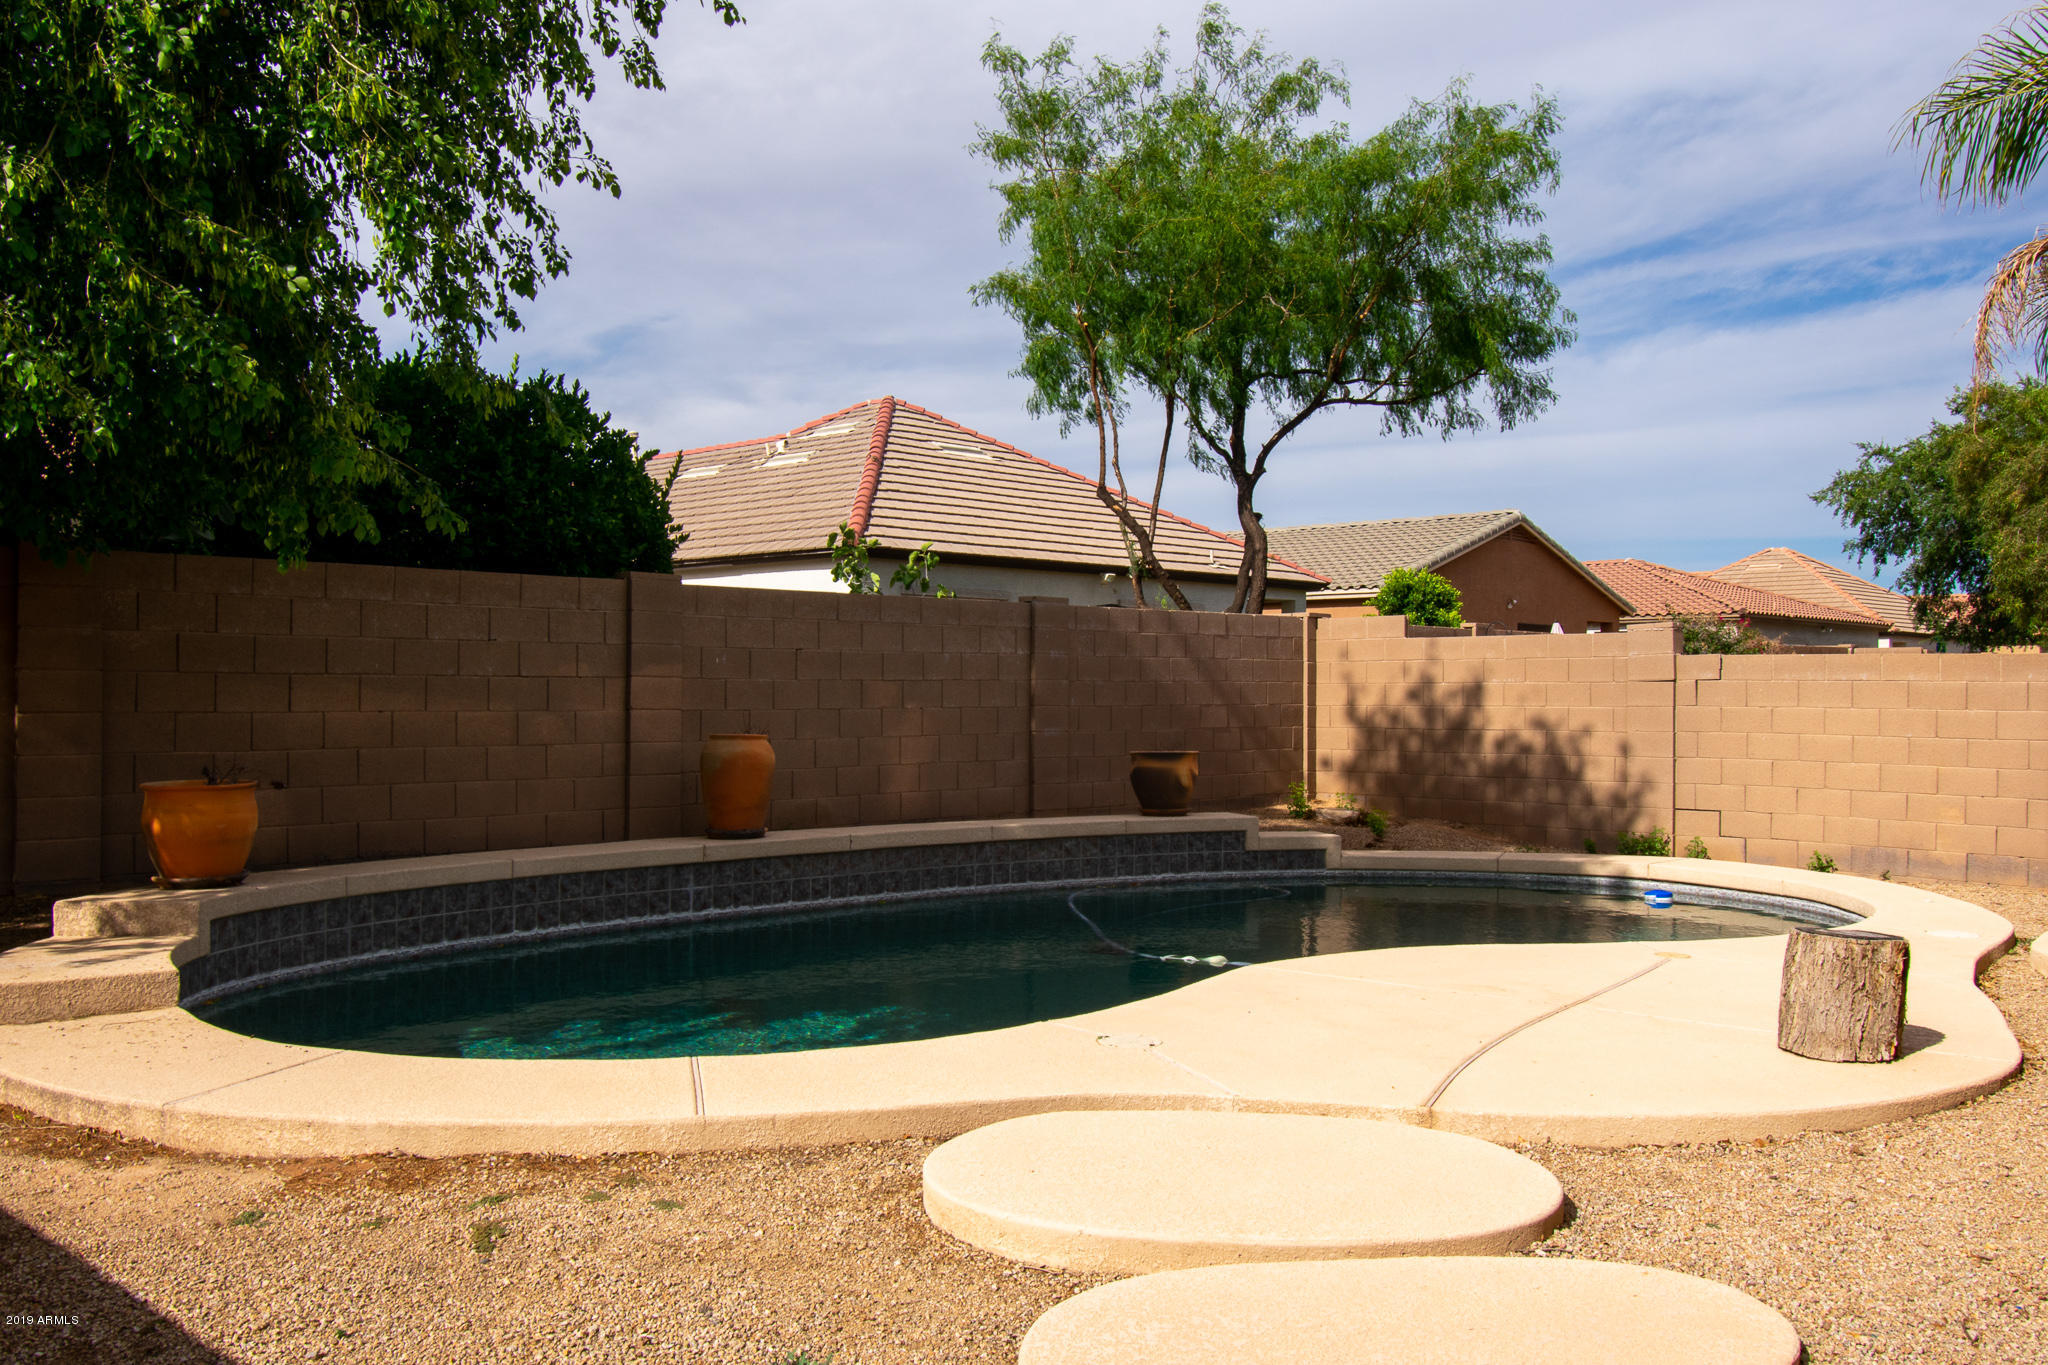 MLS 5927206 14866 W Desert Hills Drive, Surprise, AZ 85379 Surprise AZ Rancho Gabriela